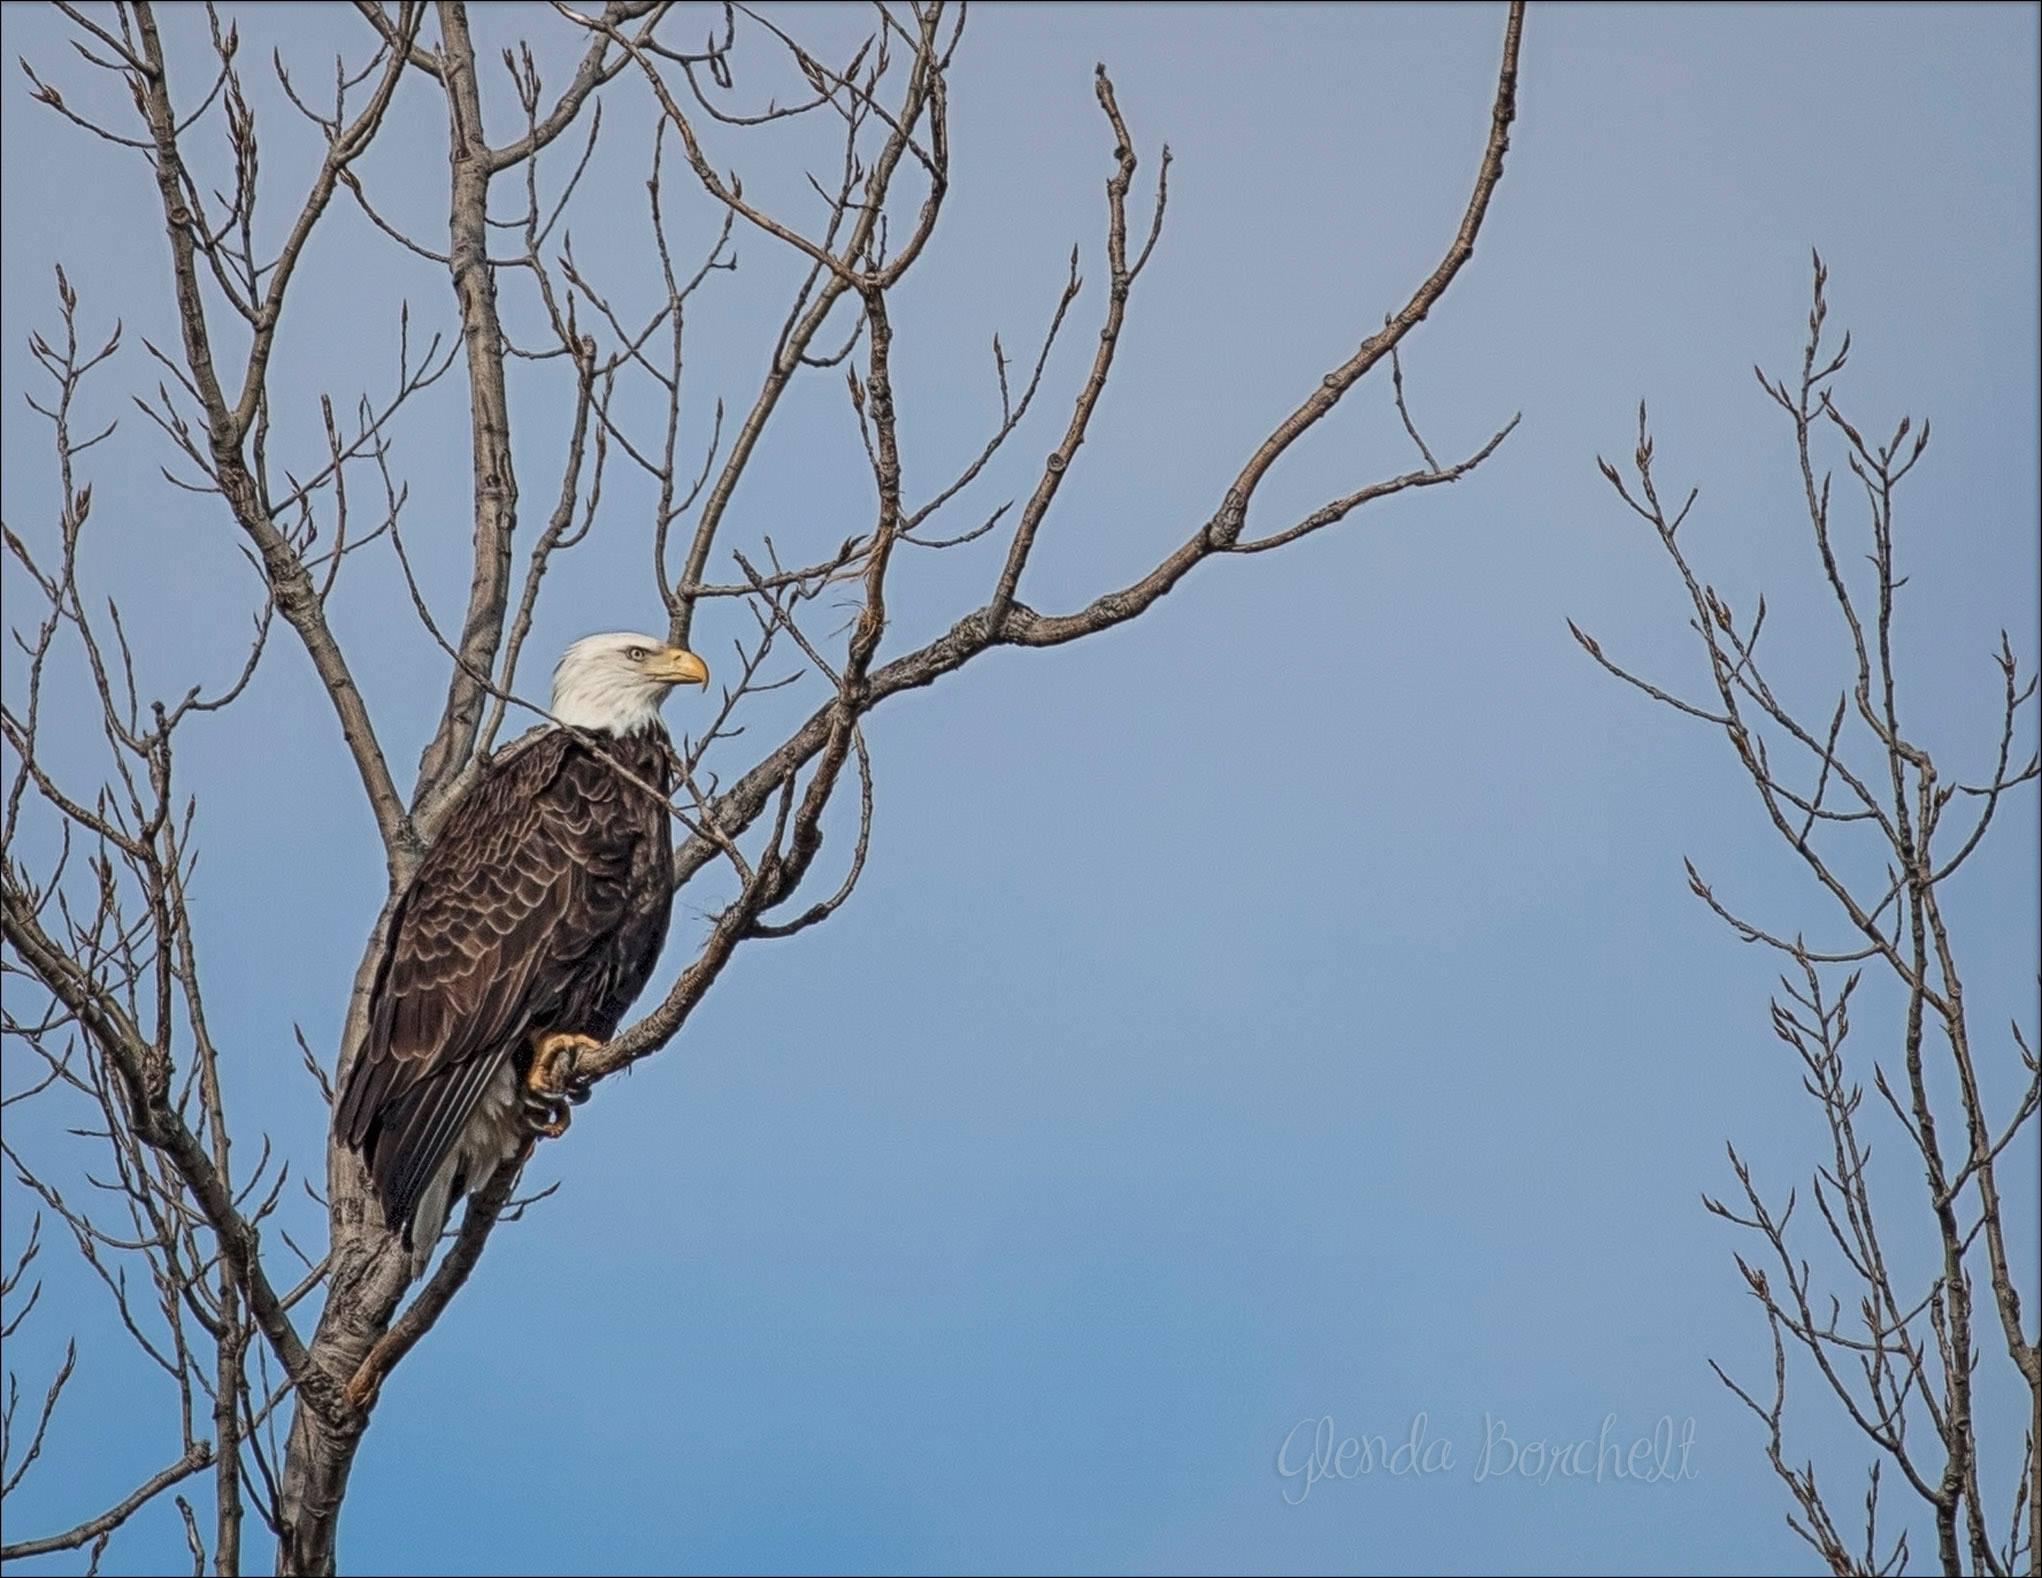 Eagle - Glenda Borchelt.jpg